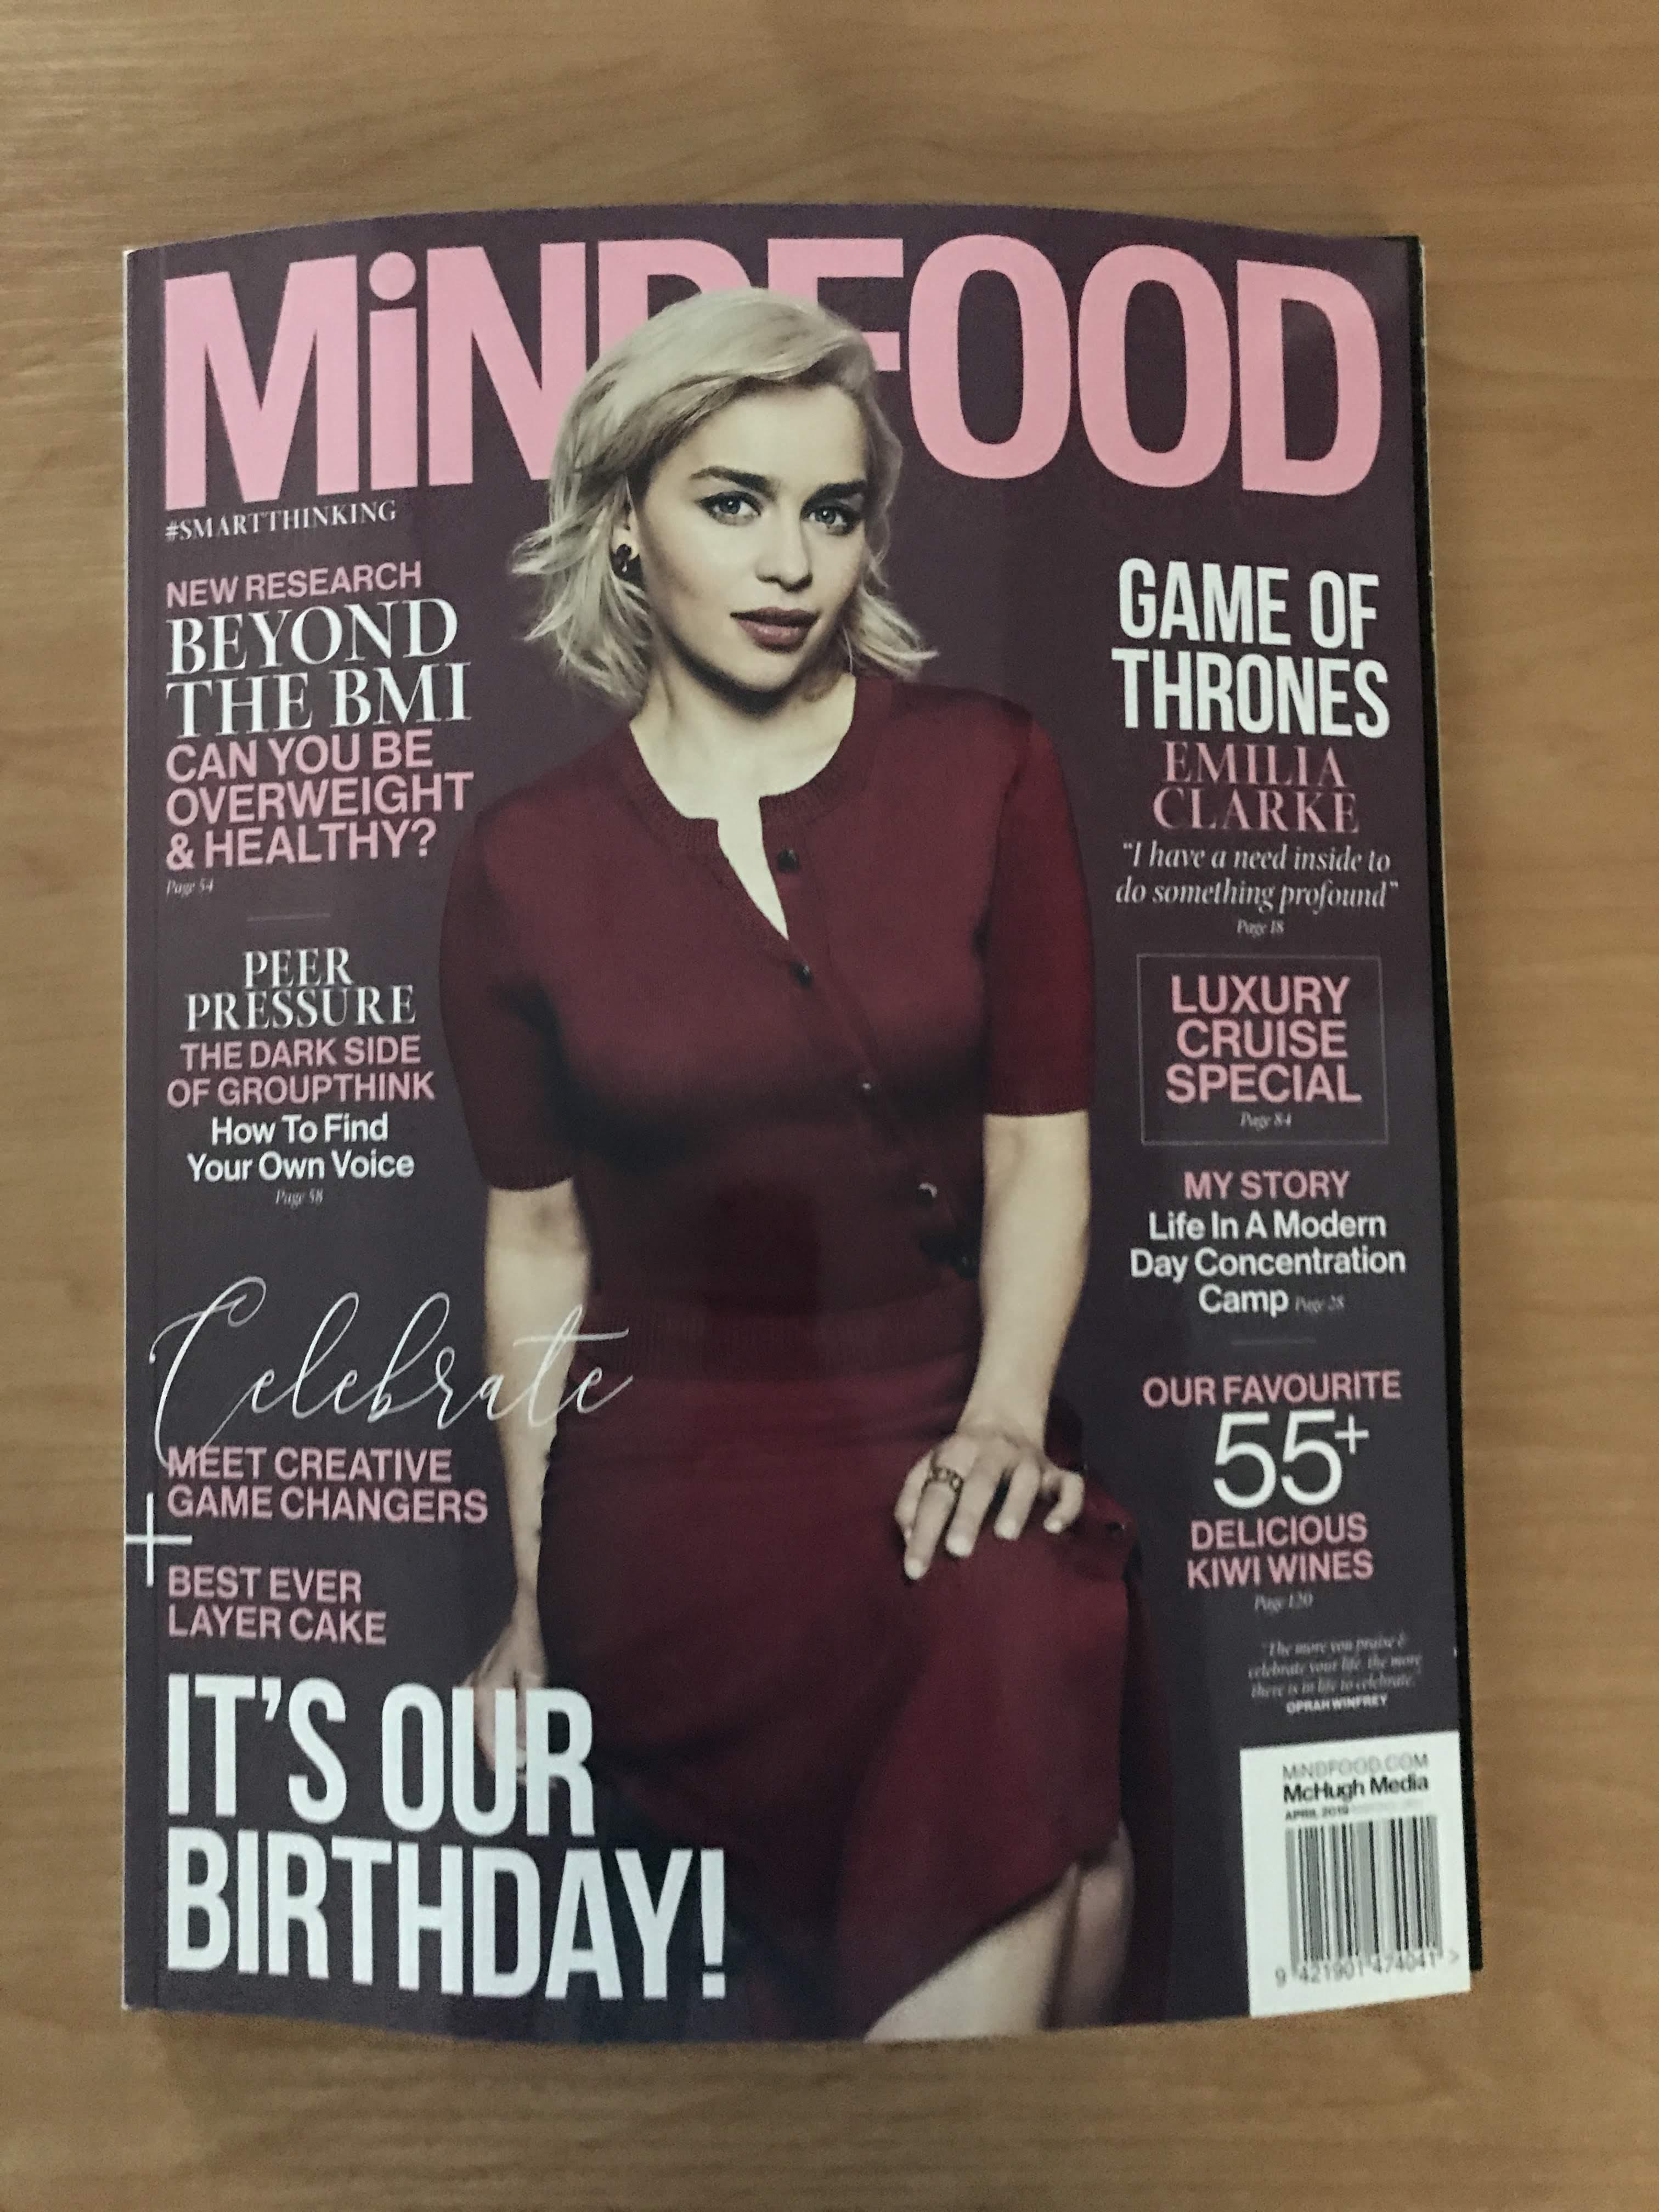 Dawnamatrix WOW's in MiNDFOOD Magazine